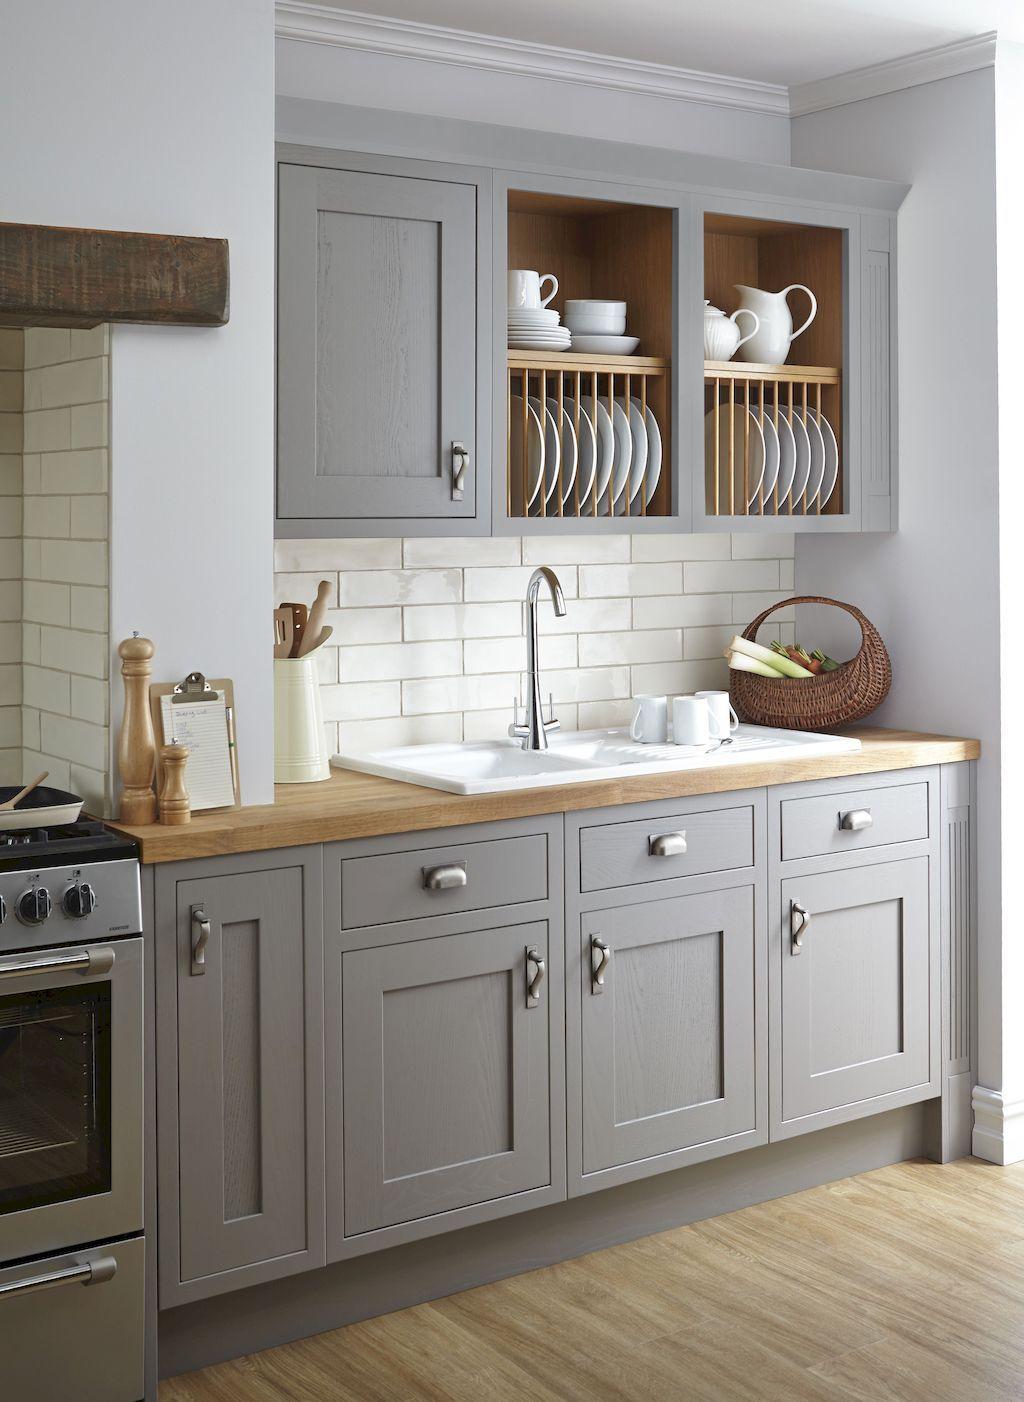 Beautiful 100 Rustic Kitchen Cabinet Ideas Http Homedecornews Info Beautiful 100 Rustic Kitc Kitchen Cabinet Design Kitchen Design Refacing Kitchen Cabinets